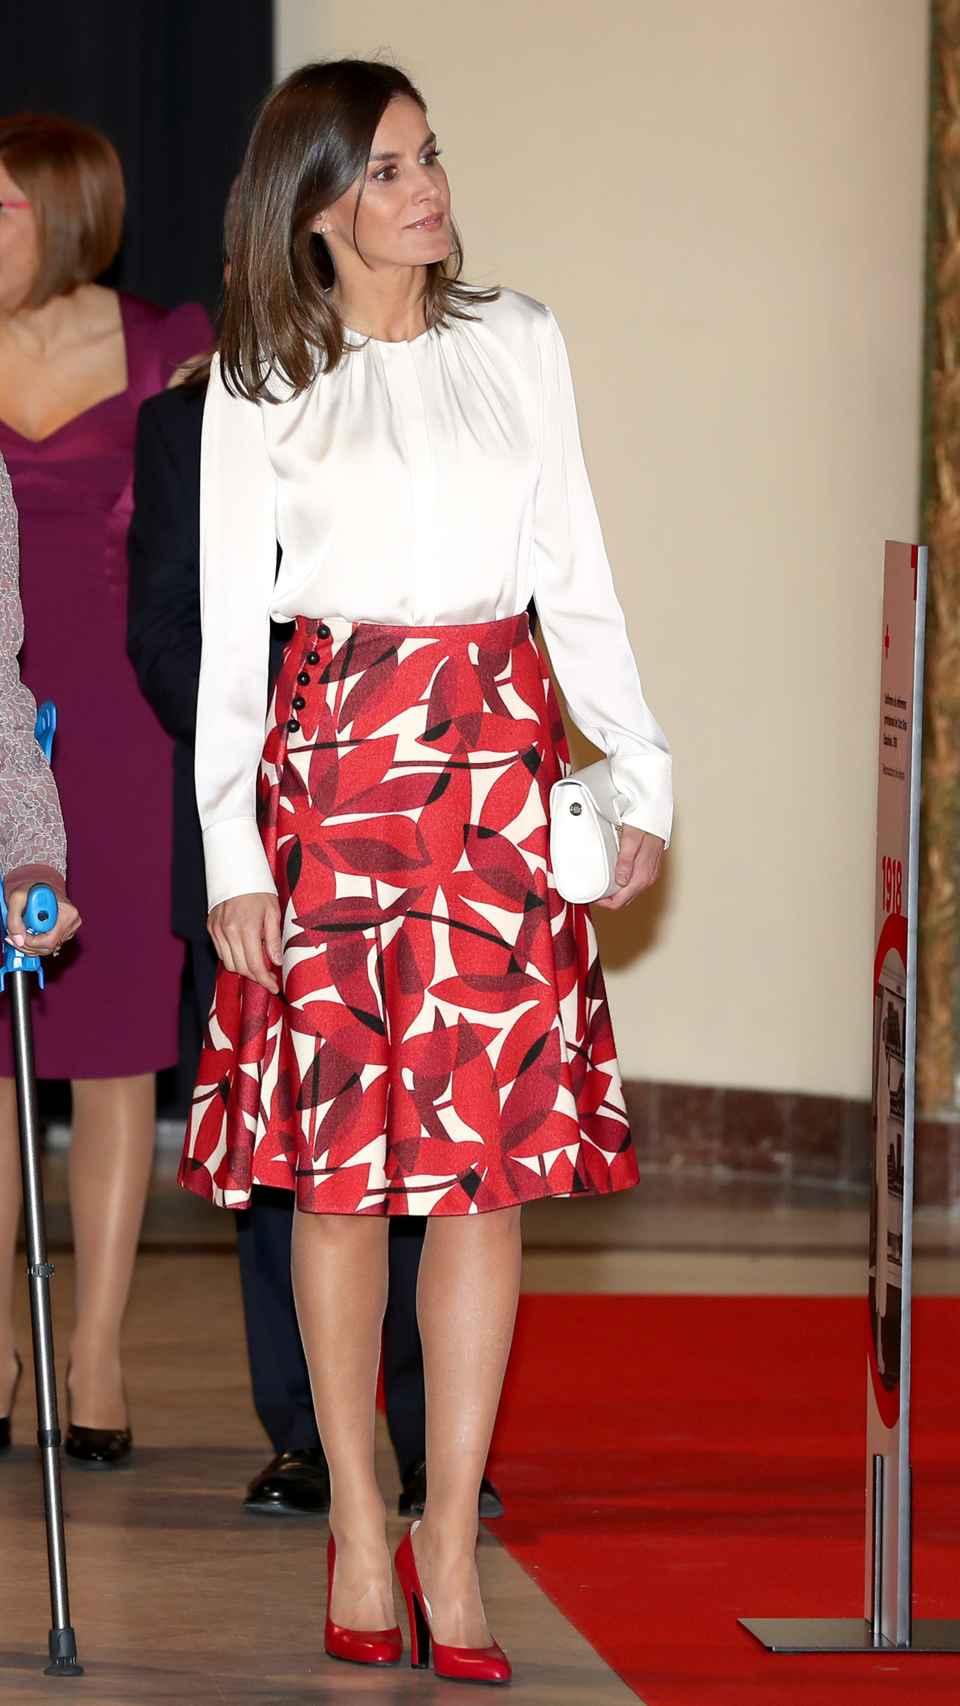 La reina Letizia con falda de Carolina Herrera y blusa de Hugo Boss.